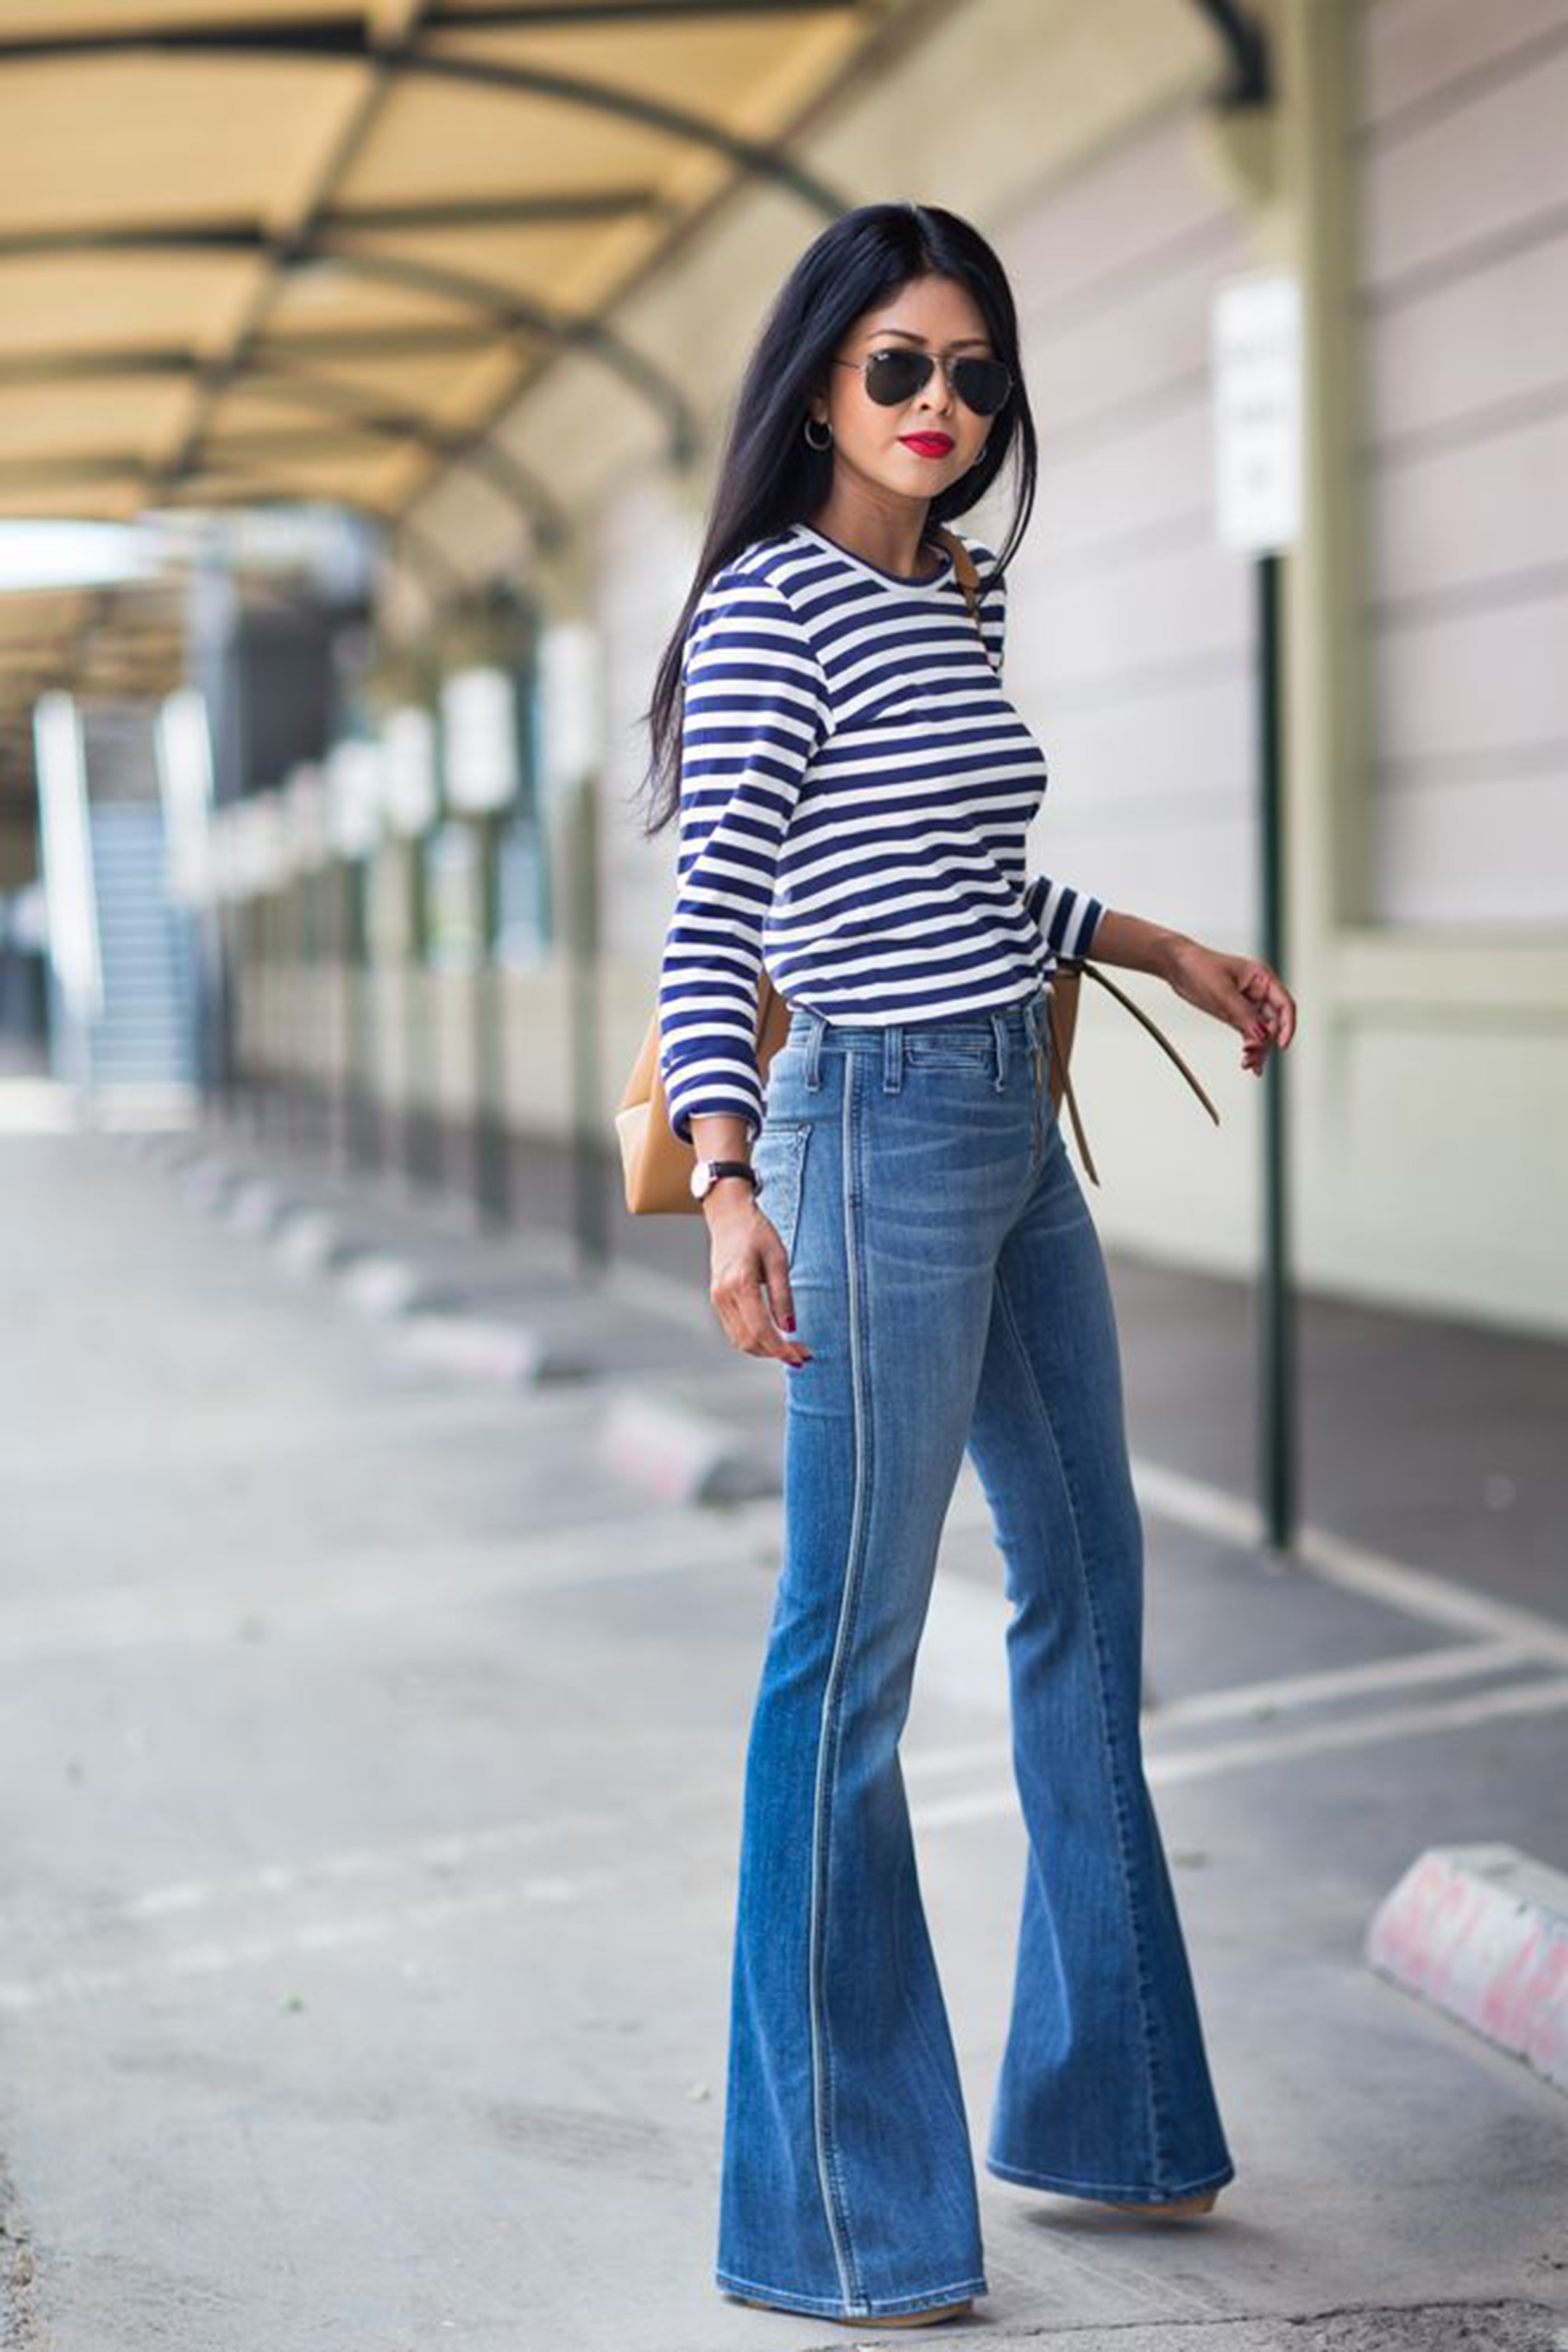 pantaloni-zampa-styleshouts-come-abbinare-seventies